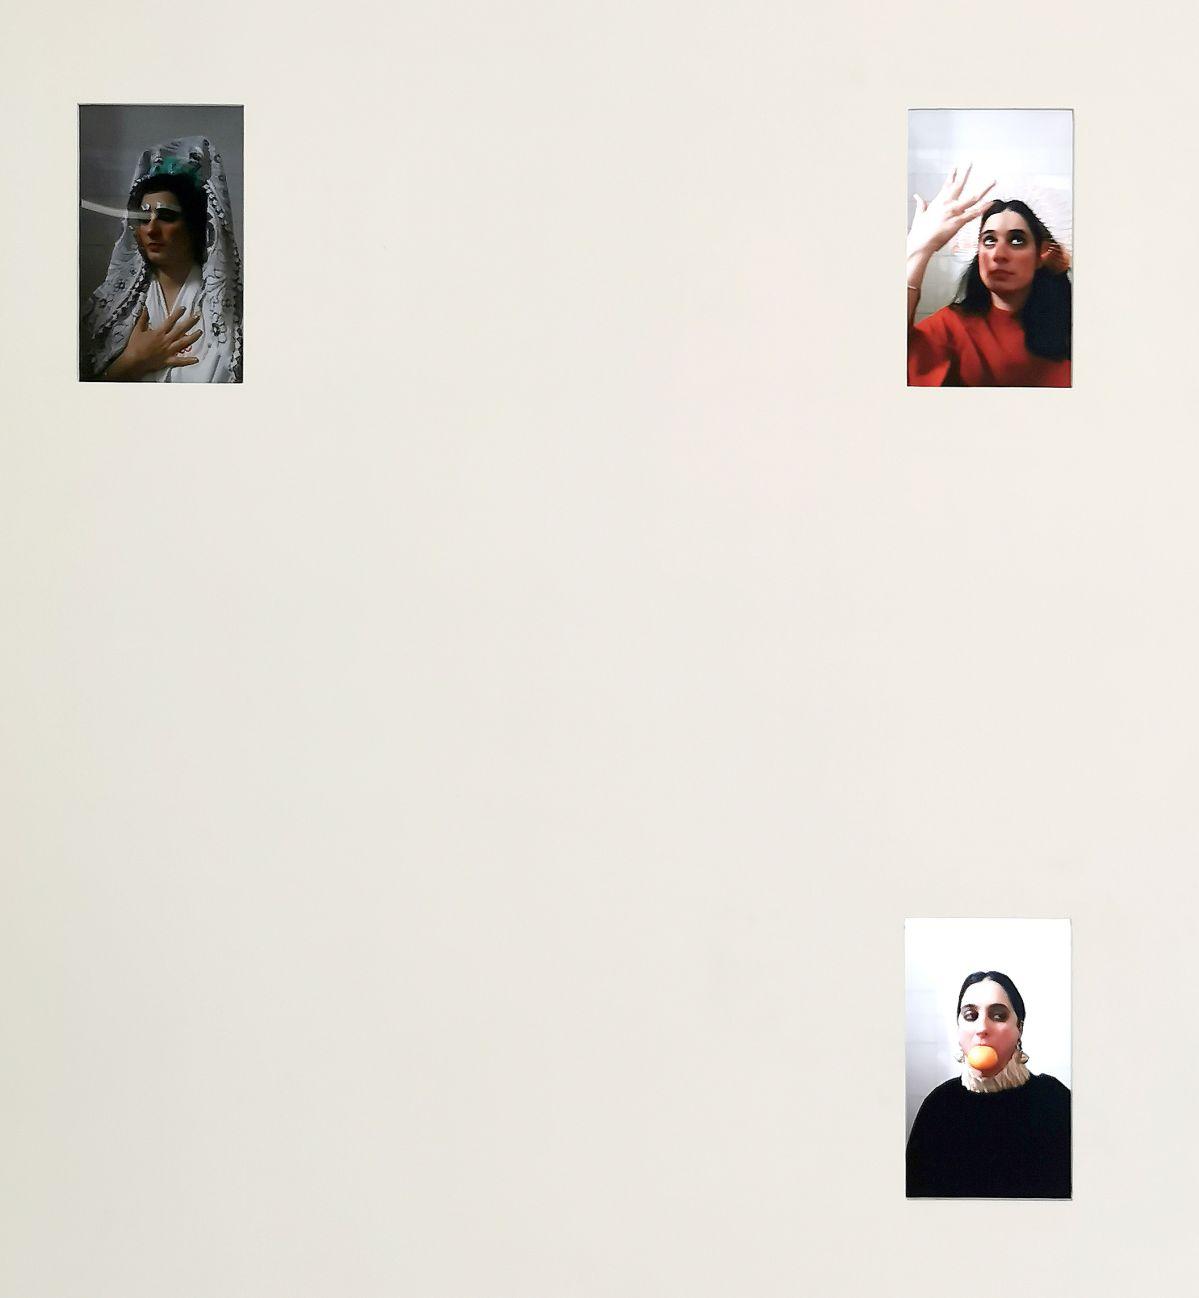 Leticia Martinez Perez - La cosmicidad de mi sala de bañio, 2020 - Des Vies - ¡ Viva Villa ! 2020 - Les vies minuscules à la Collection Lambert, Avignon